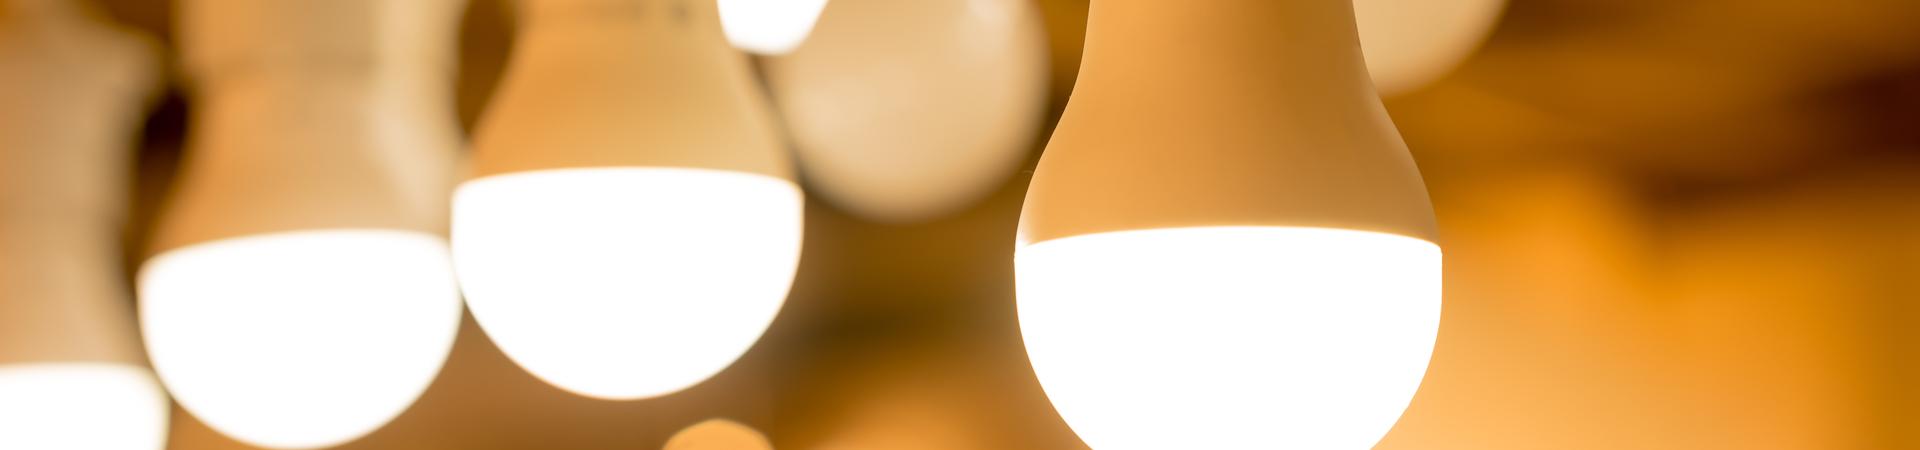 wiklick-ingrosso-illuminazione-led-bergamo-2.jpg